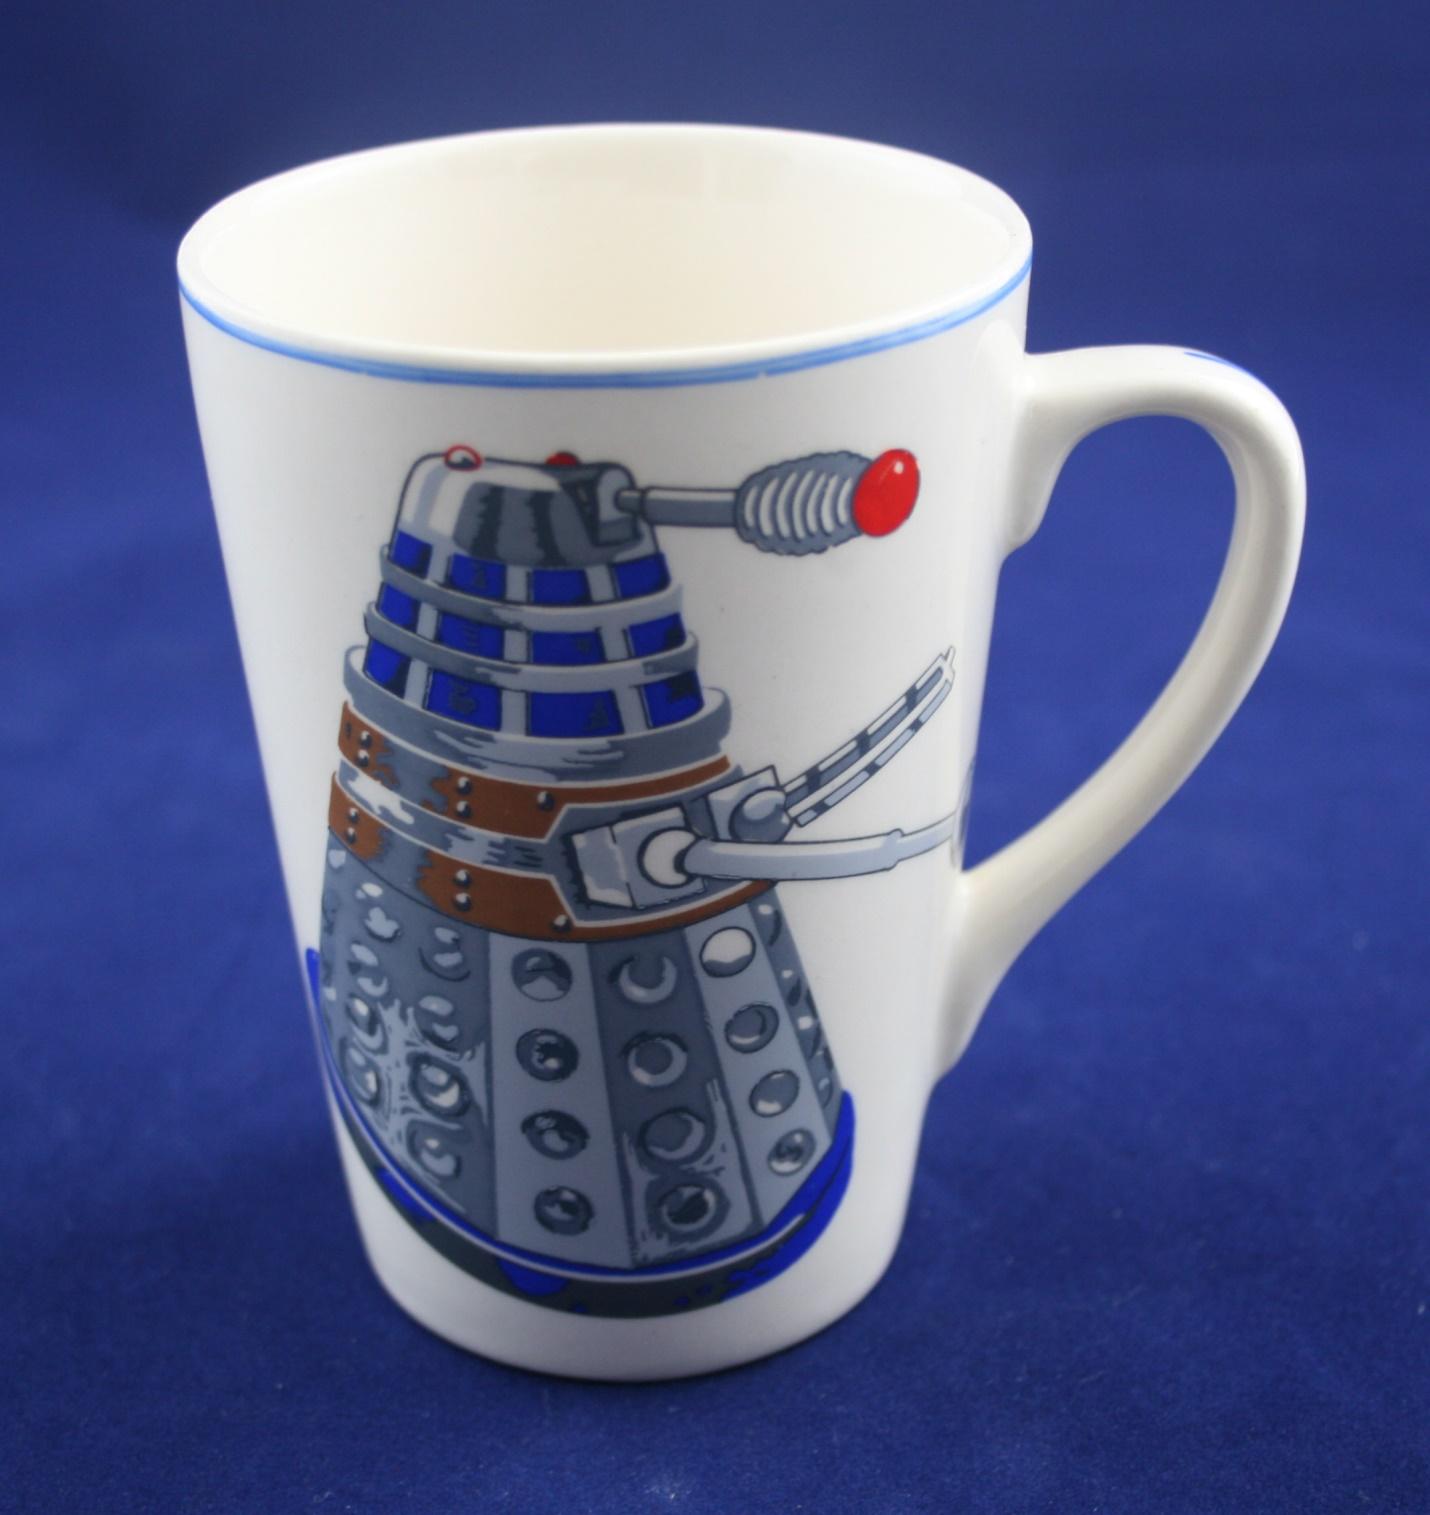 J H Weatherby and Sons Ltd., Dalek mug